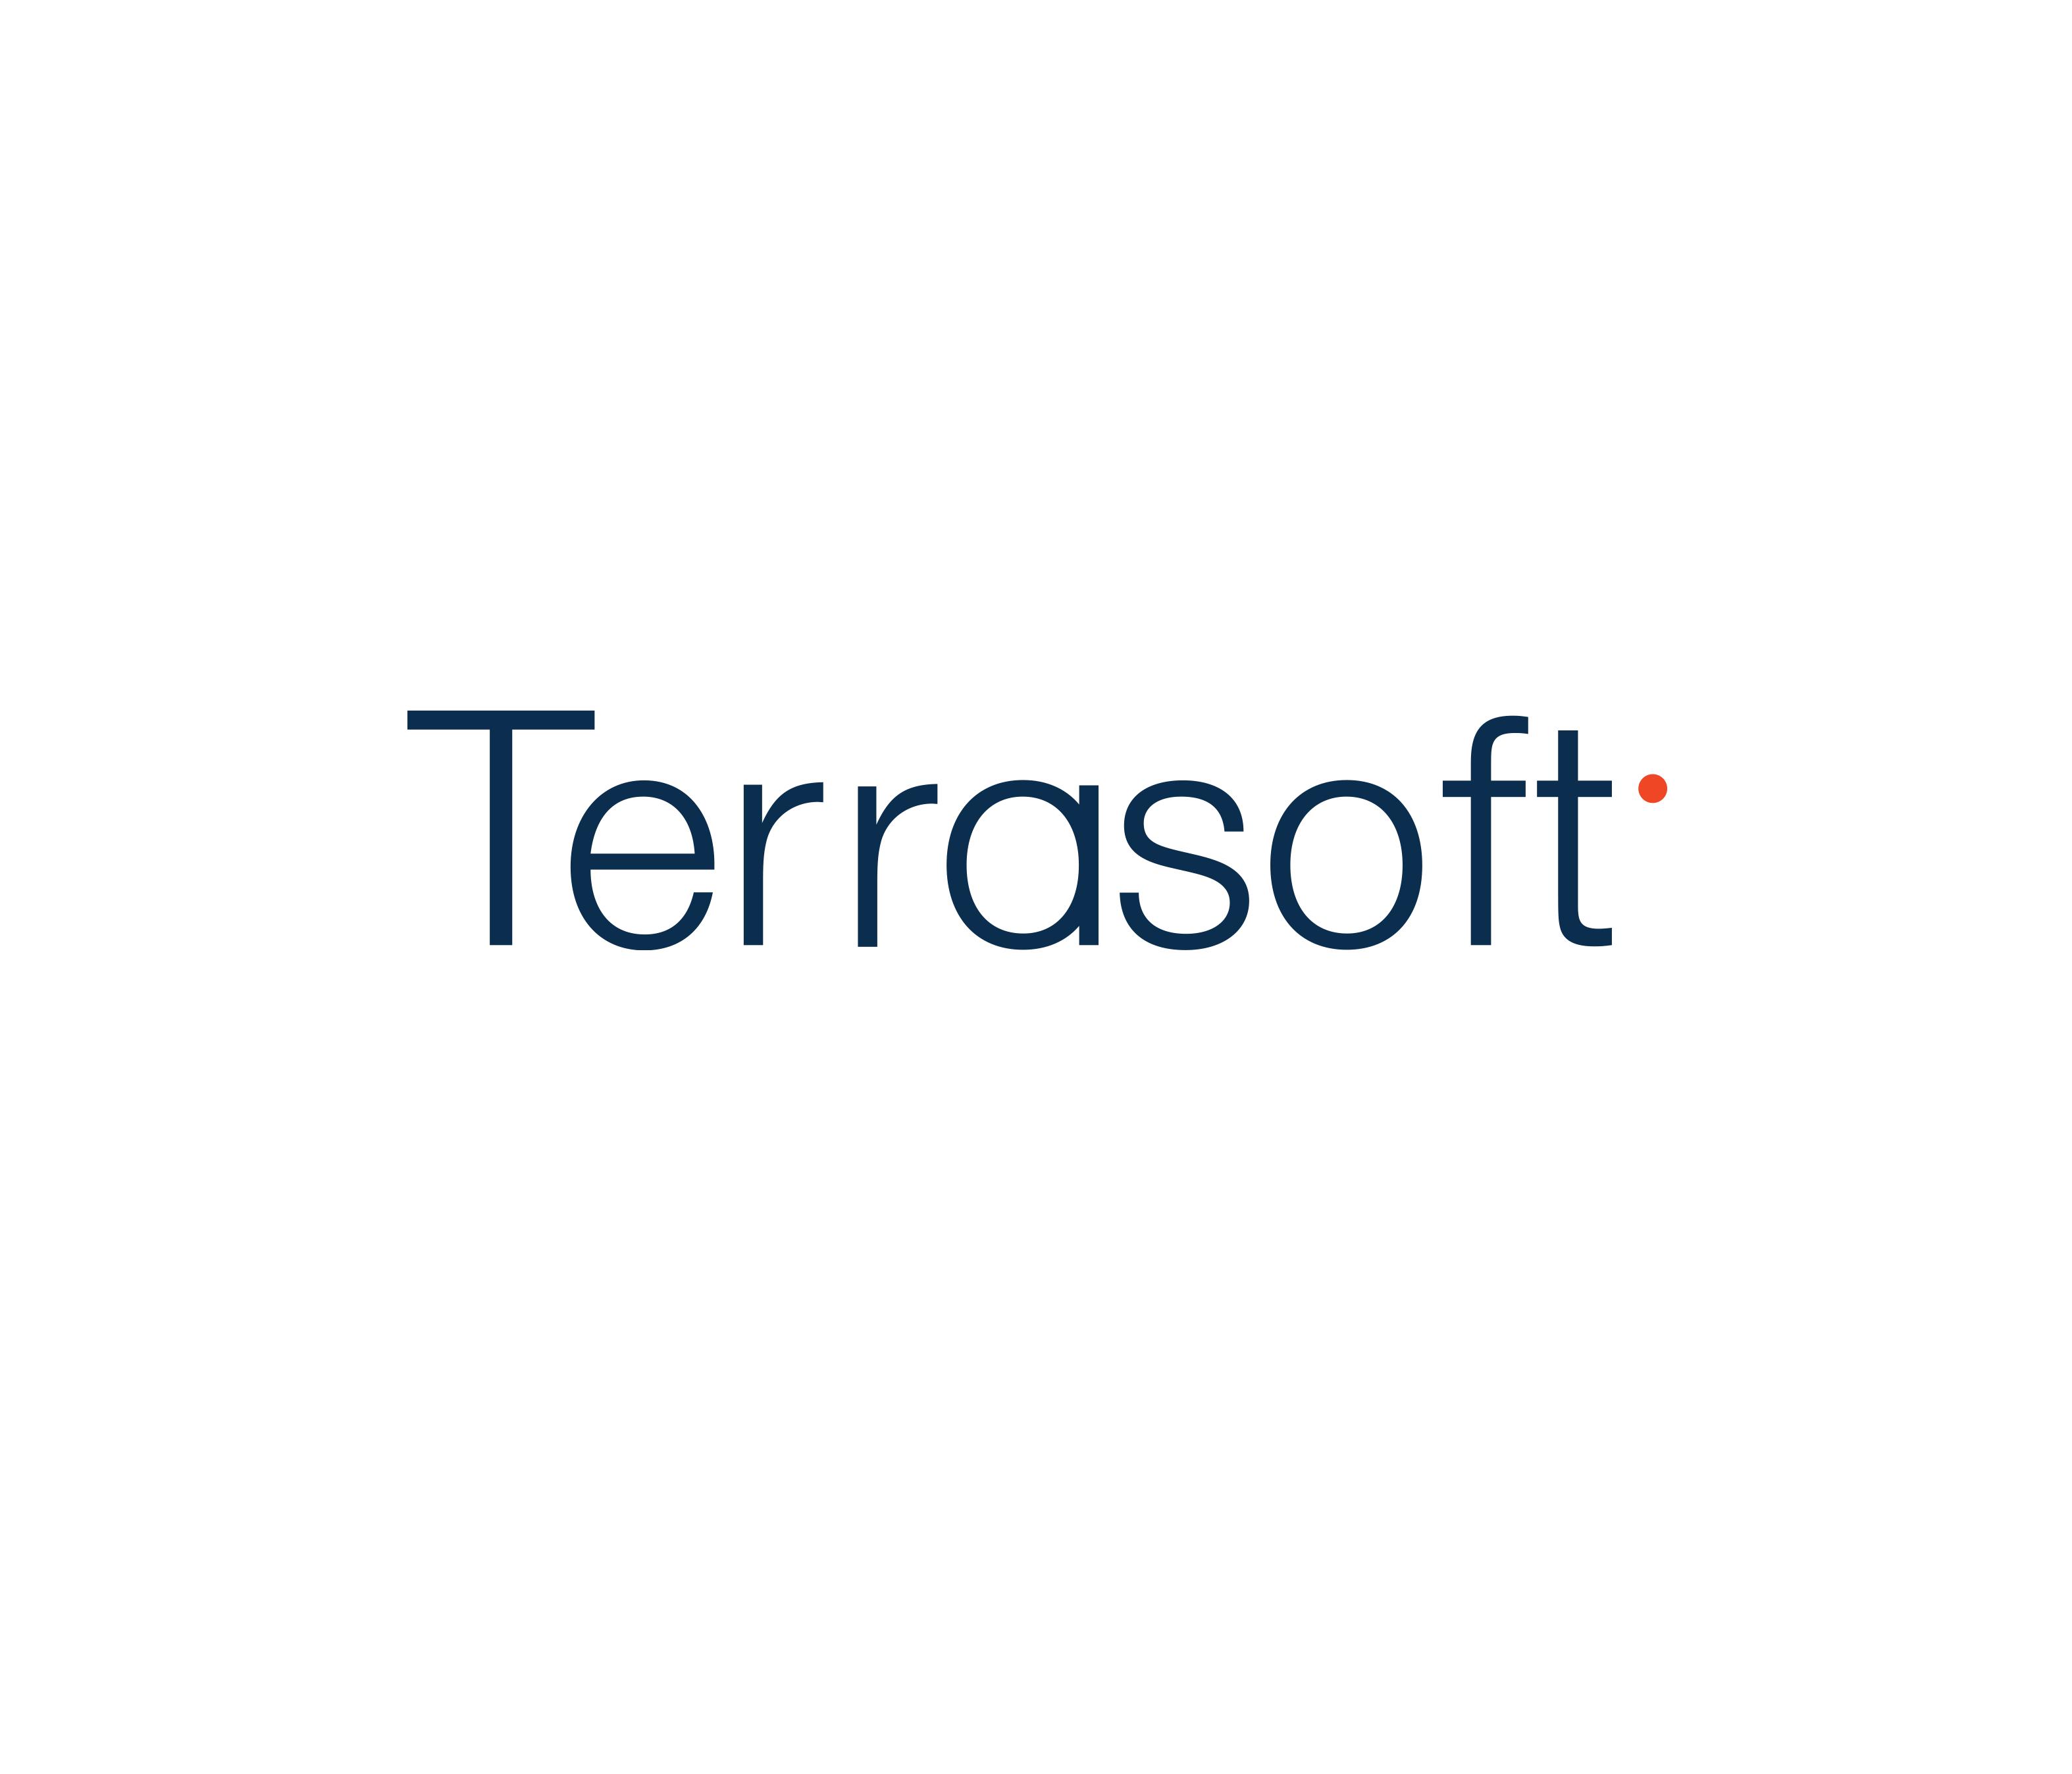 Terrasoft logo